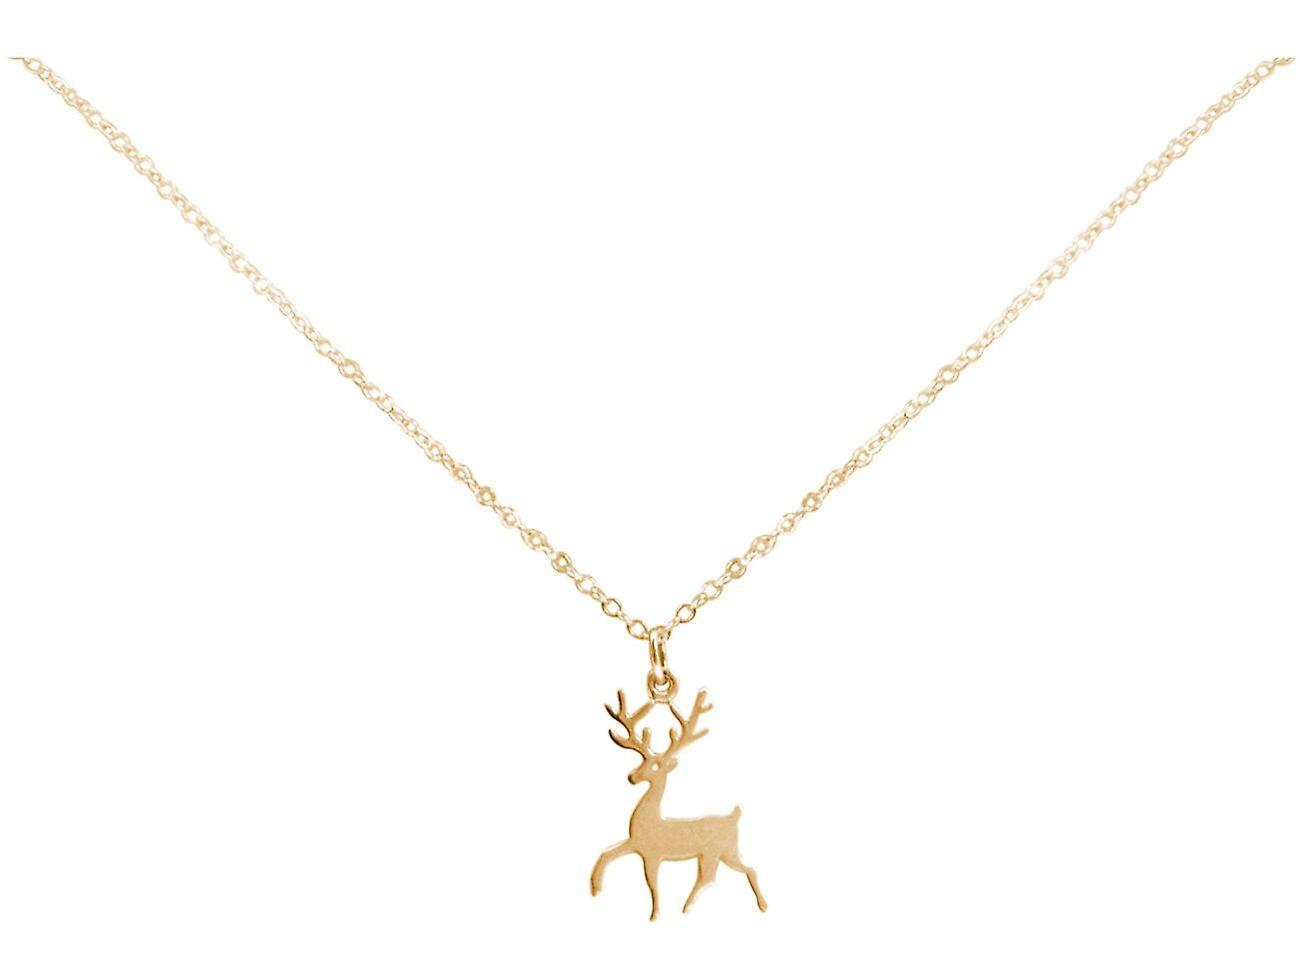 Gemshine Deer Elk sakara kaula koru riipus 925 hopea, kullattu, ruusu Bambi